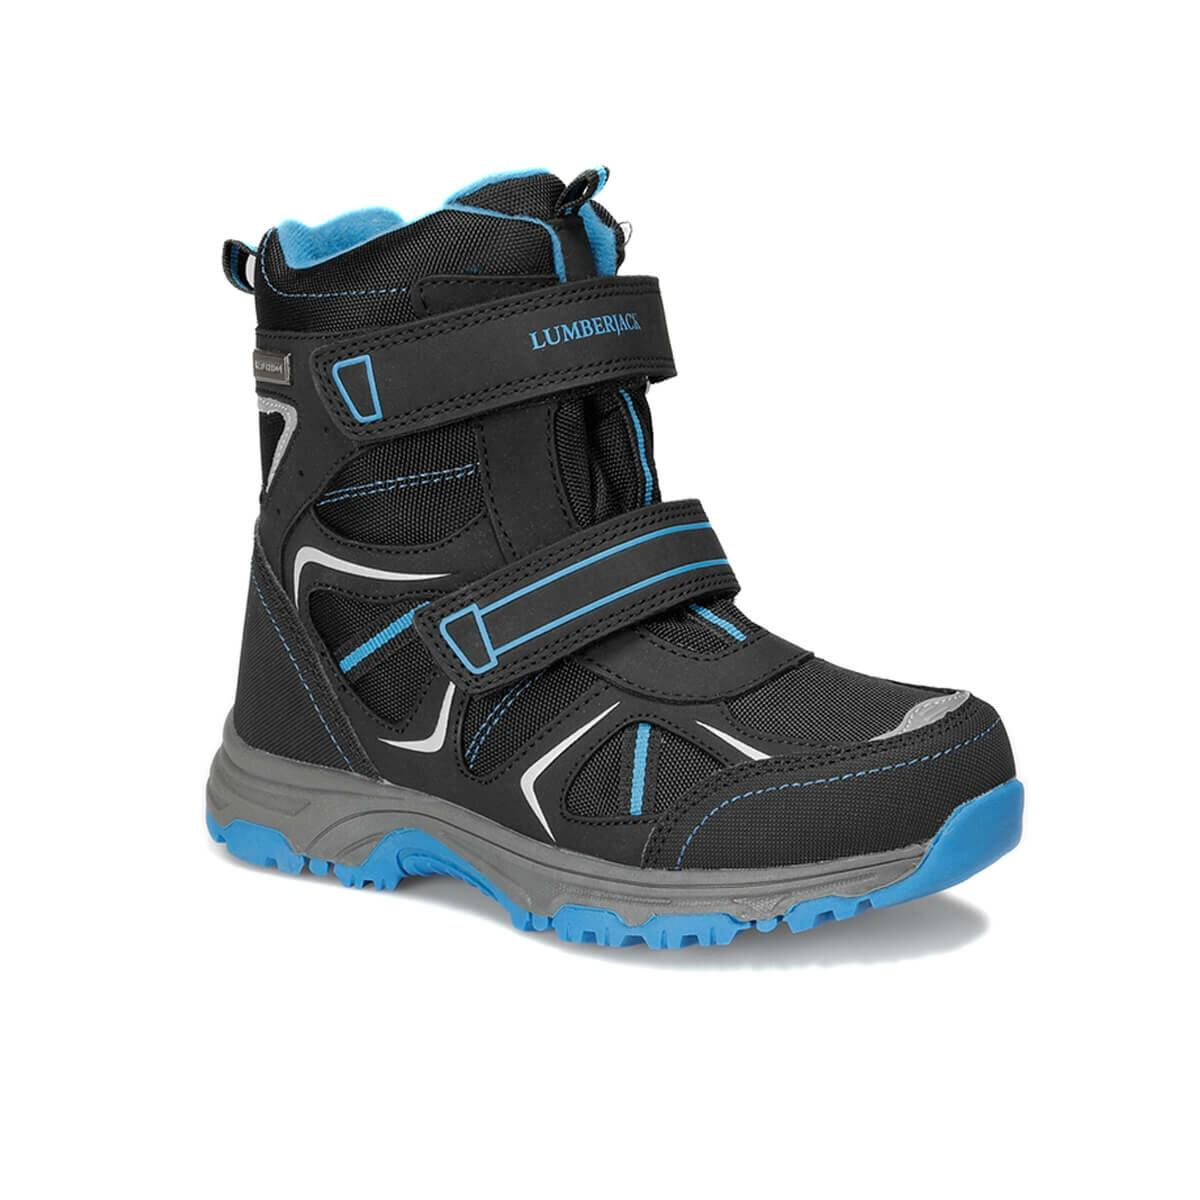 FLO LIGHT 9PR Black Male Child Outdoor Boots LUMBERJACK